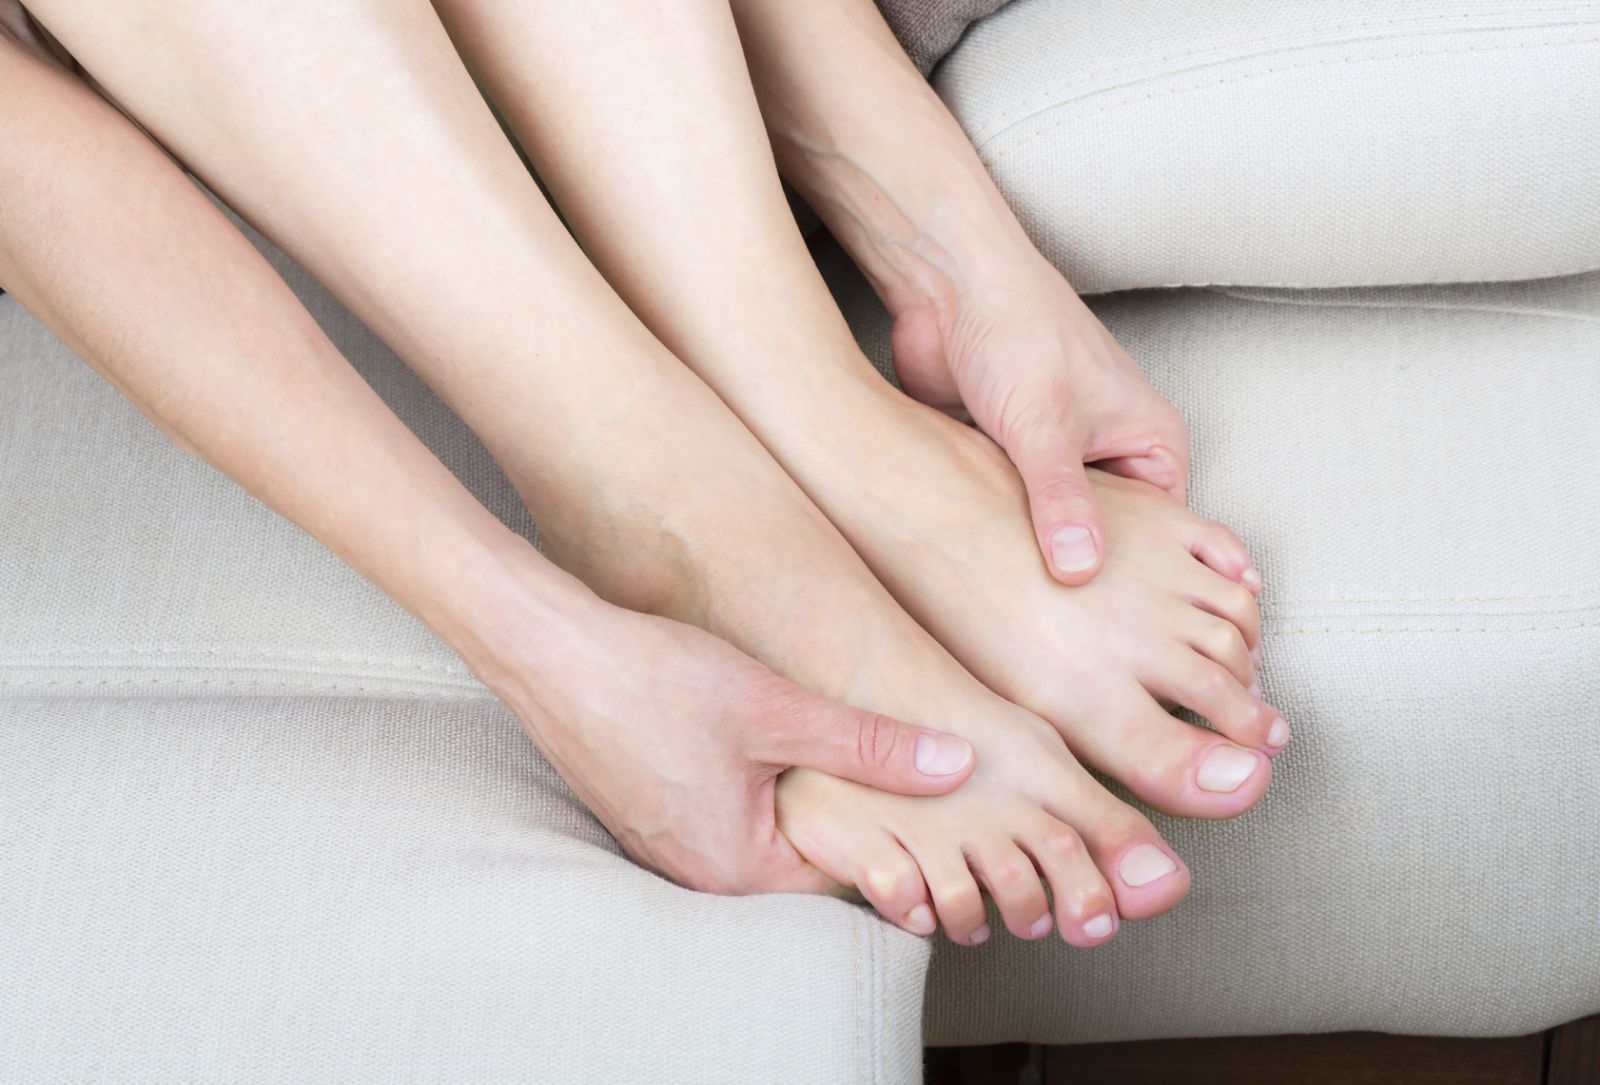 foot-massage-care-feet